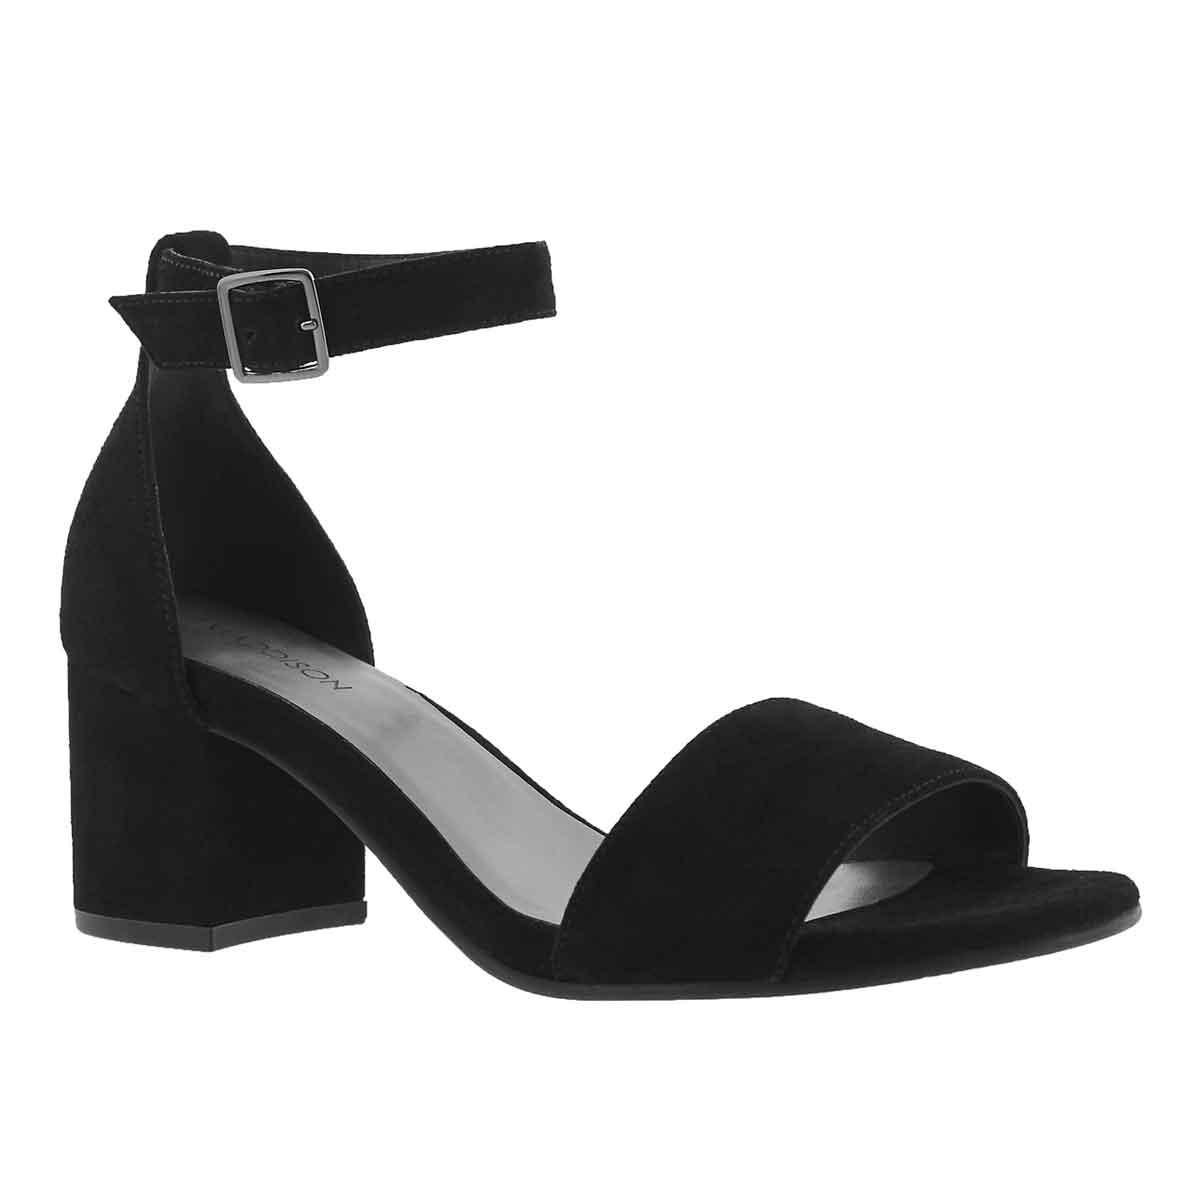 Women's FREDA black dress sandals